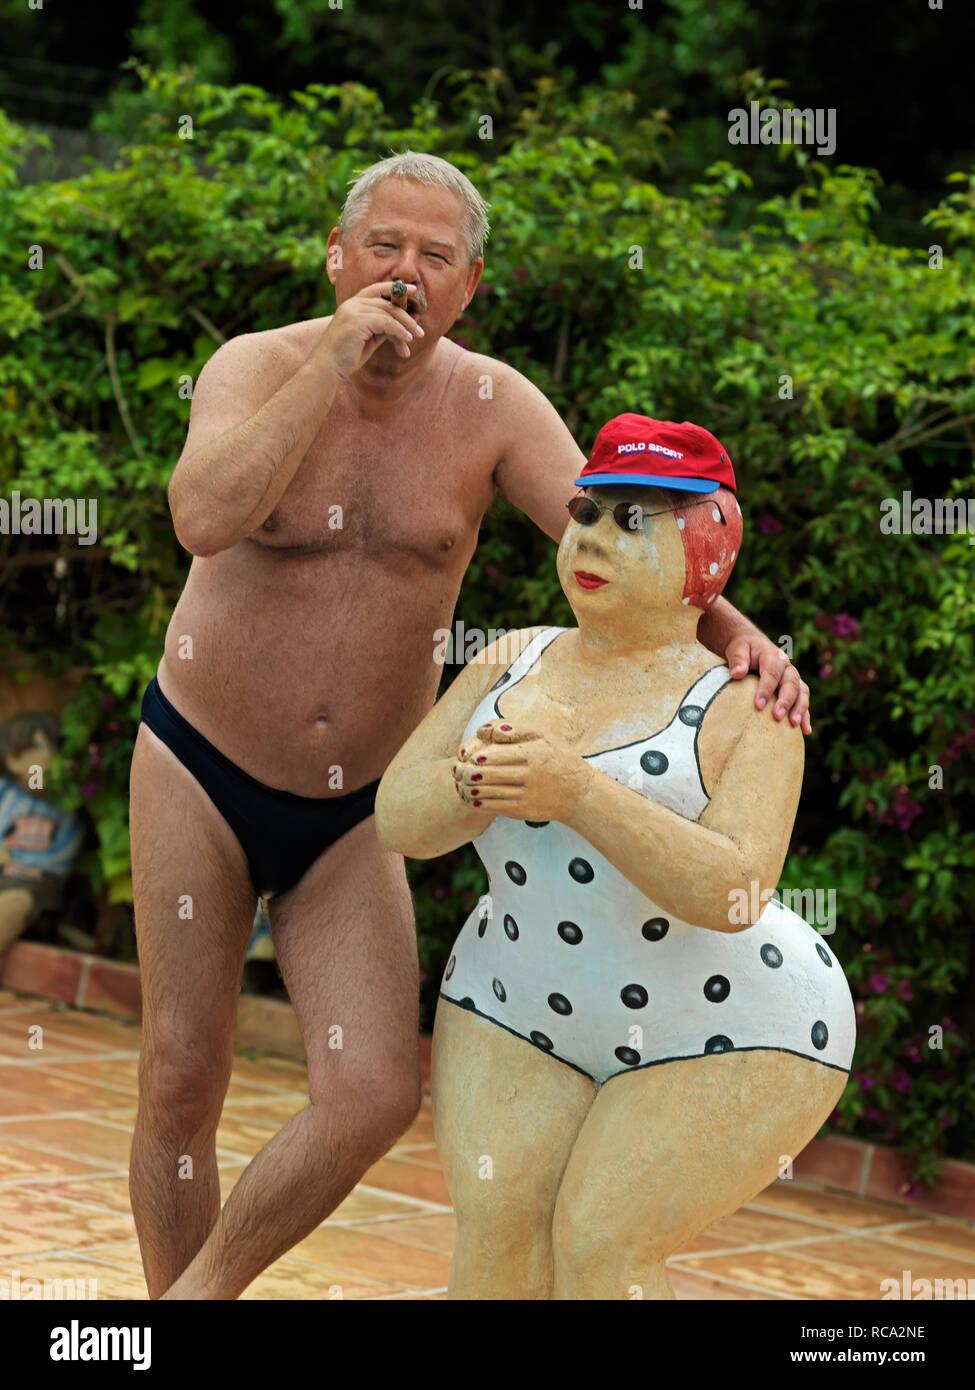 älterer Mann in Badehose steht neben Skulptur von Christel Lechner | elderly man in bathing-trunks standing beside a sculpture from Christel Lechner Stock Photo